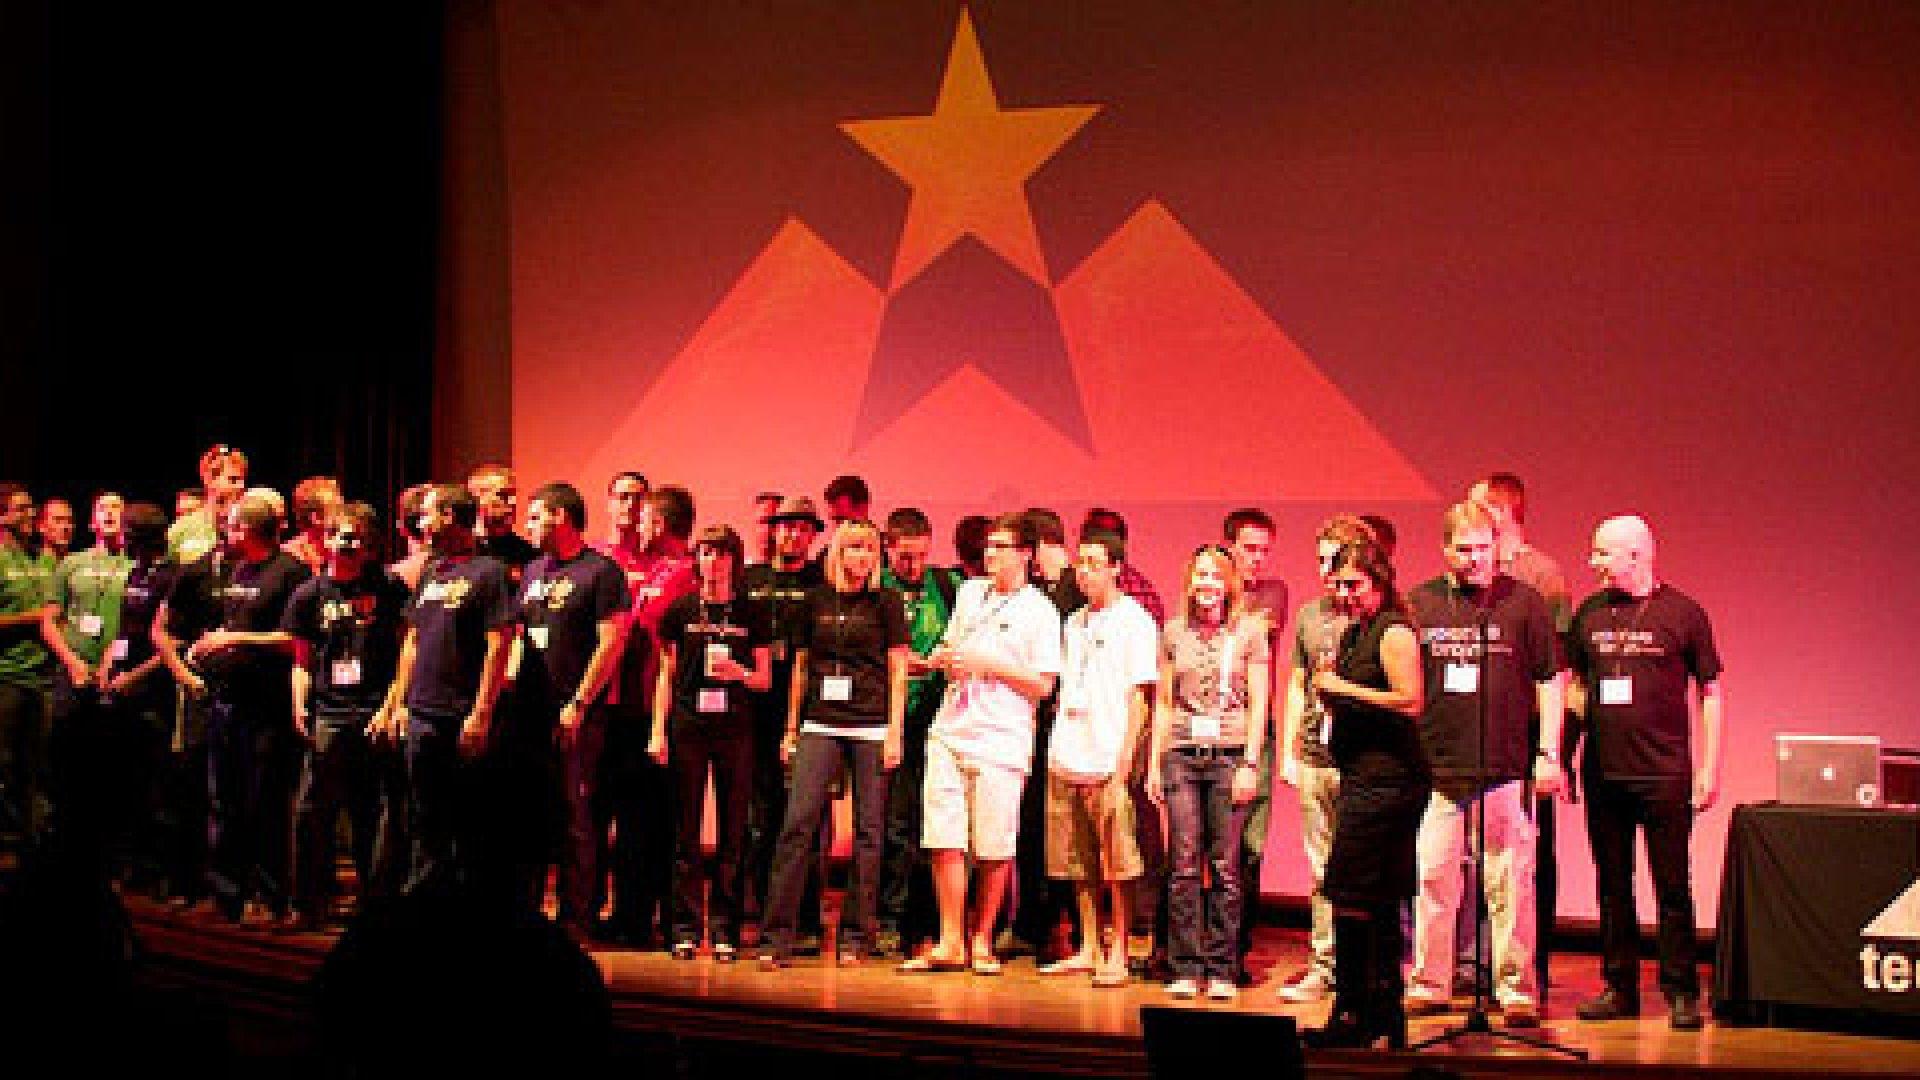 TechStars Demo Day 2011